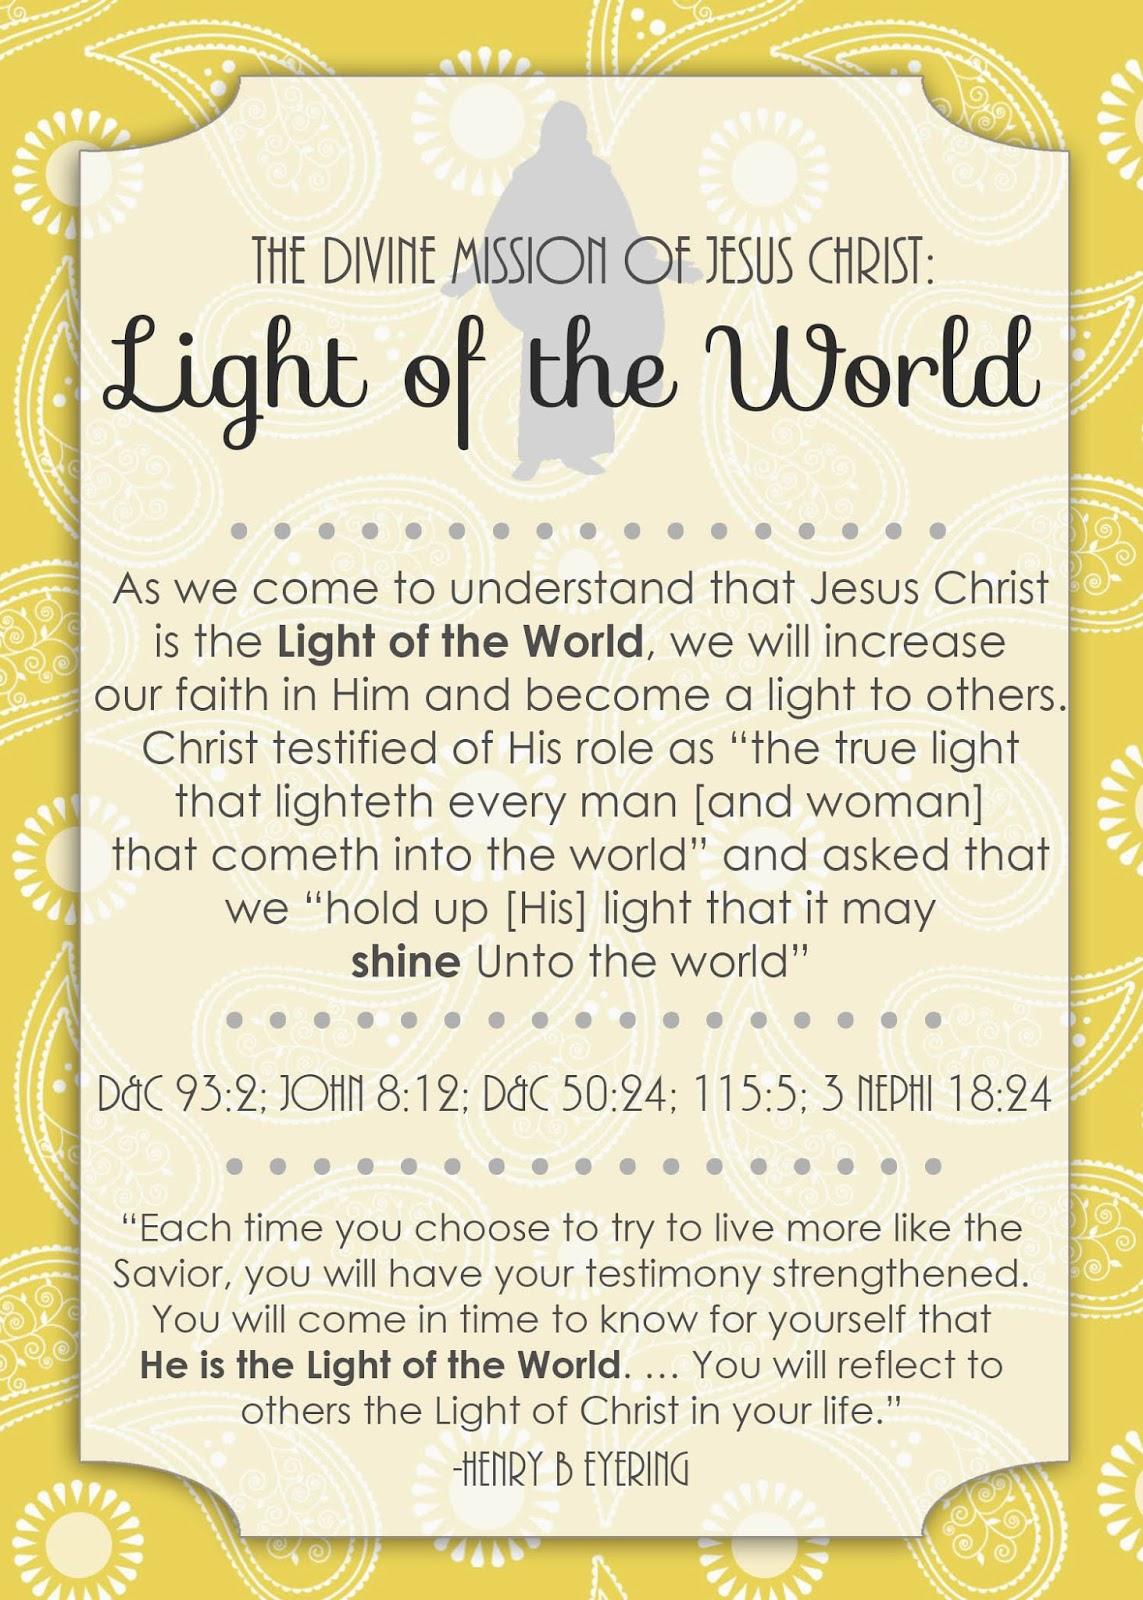 ... of Jesus Christ: Light of the World - Little LDS IdeasLittle LDS Ideas